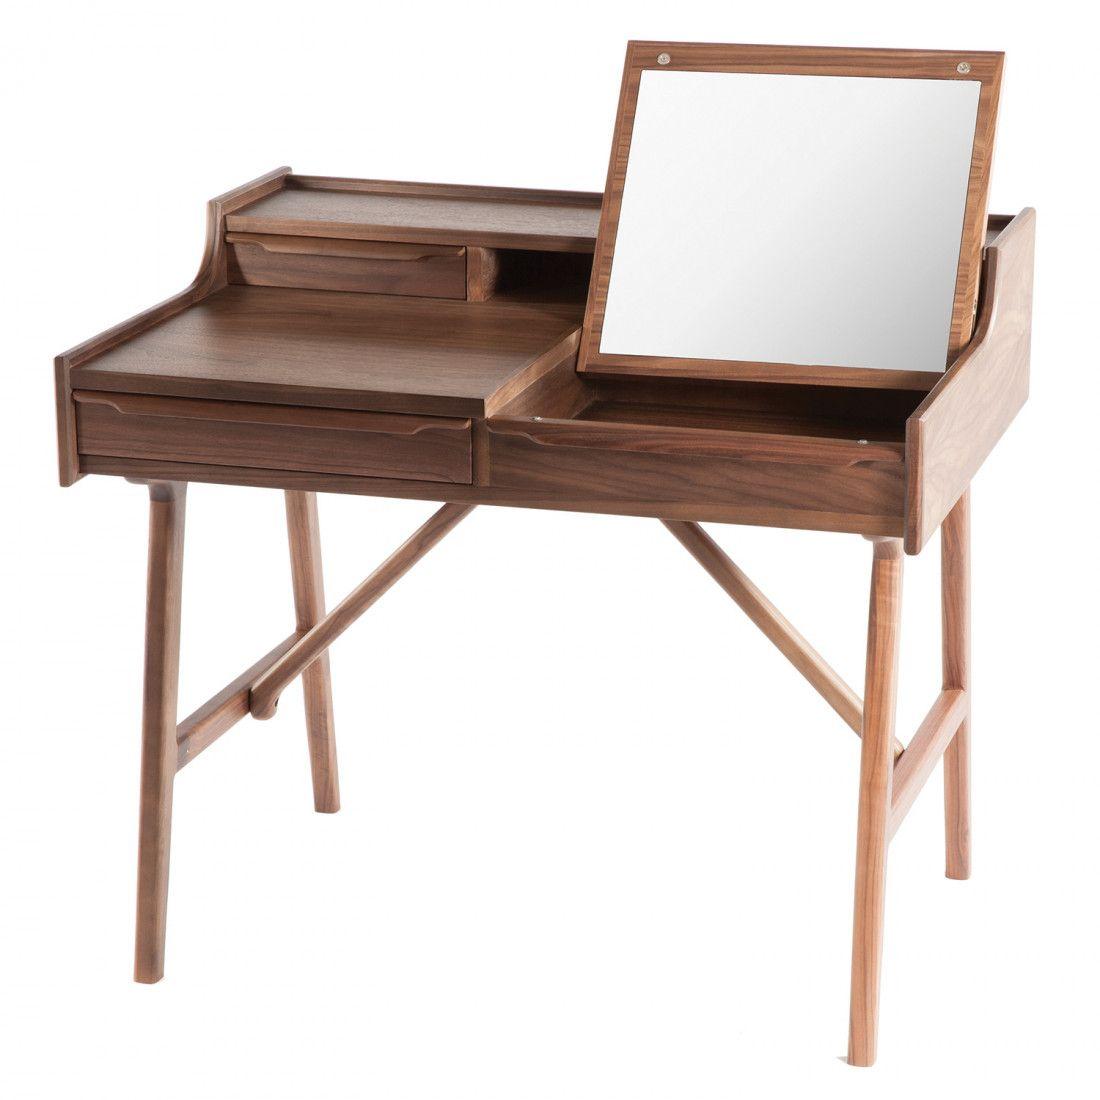 ingel desk | mid-century modern, desks and mid century